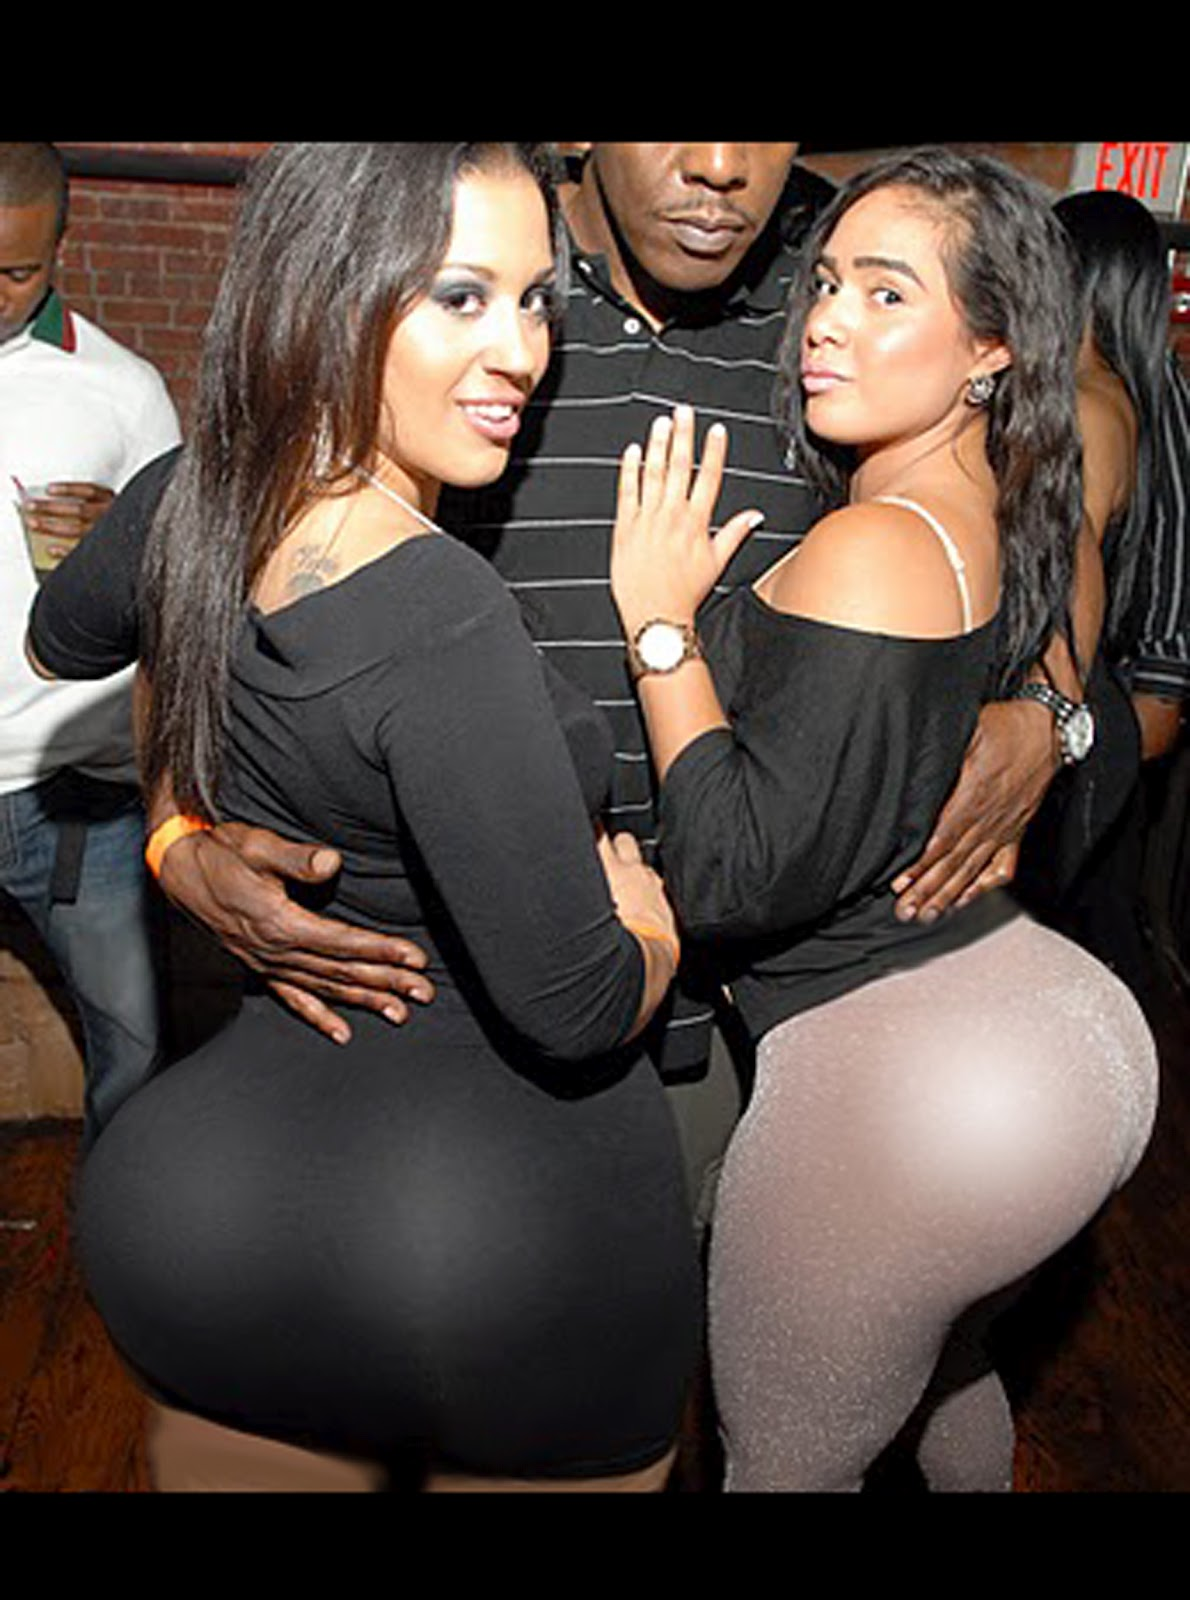 The big ass party luna night club